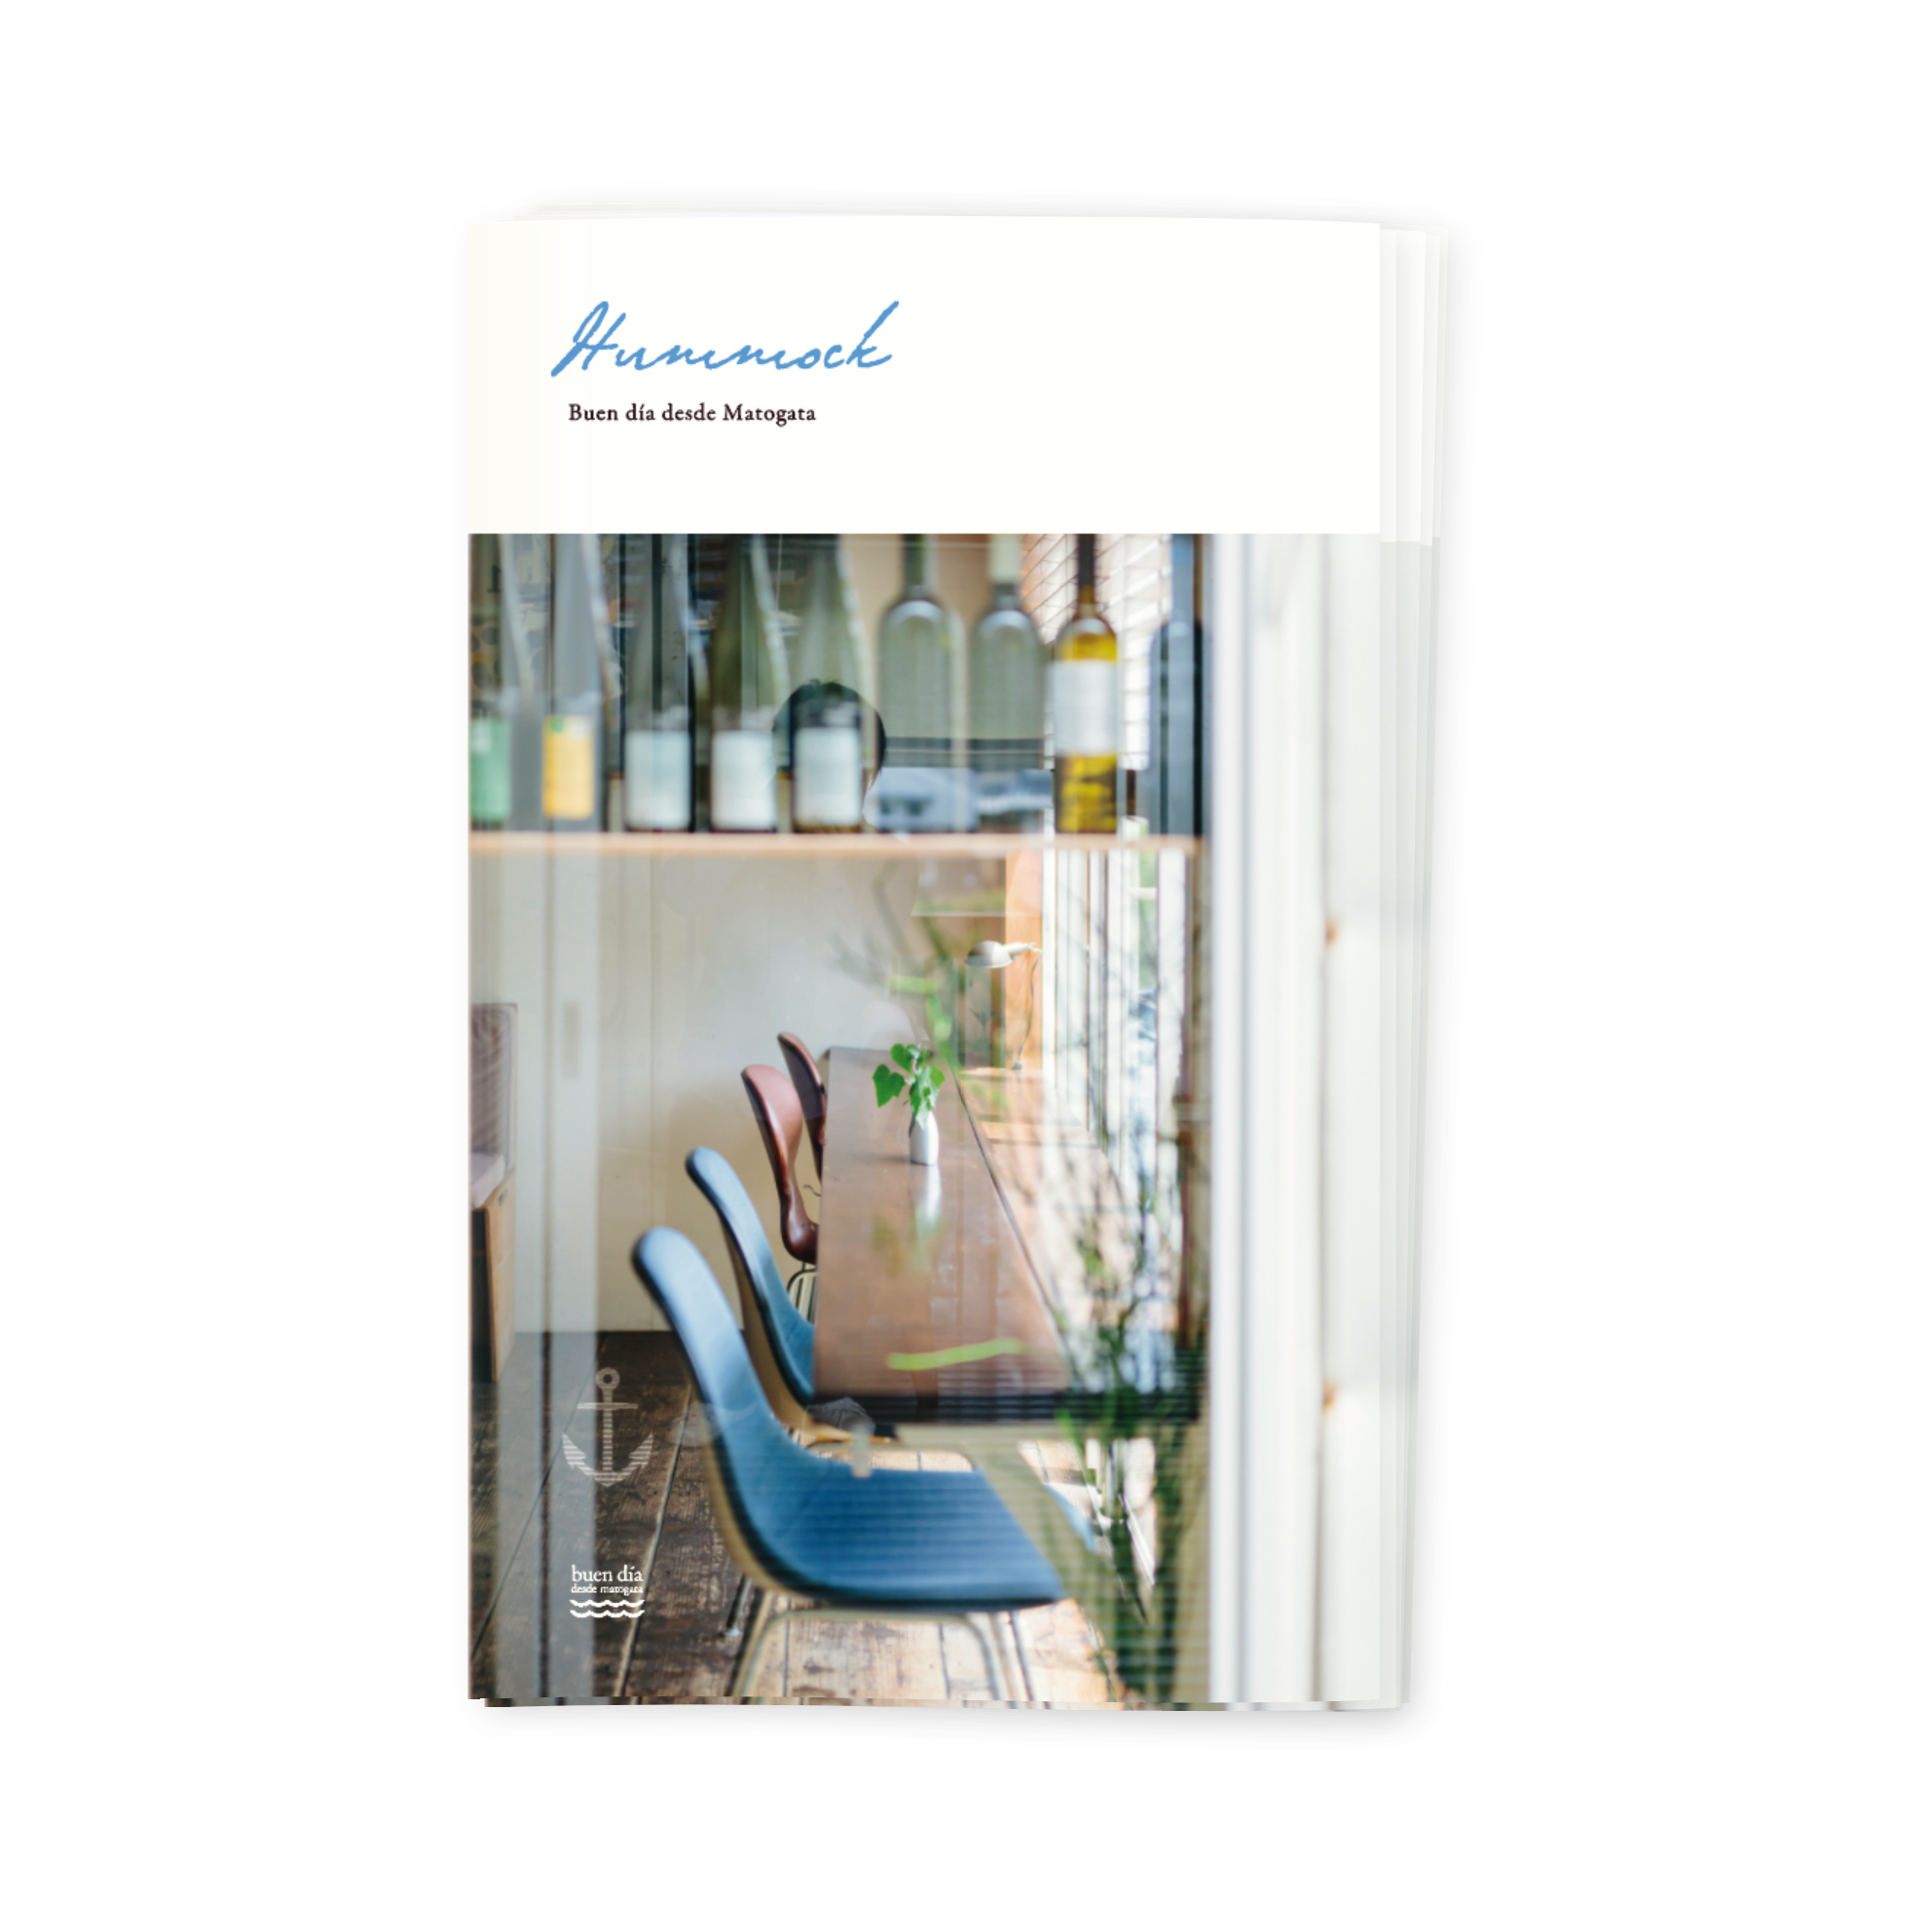 Hummock|Brochure|パンフレット/ブロシュアー|グラフィックデザイン 写真 ブランドデザイン|兵庫県姫路市